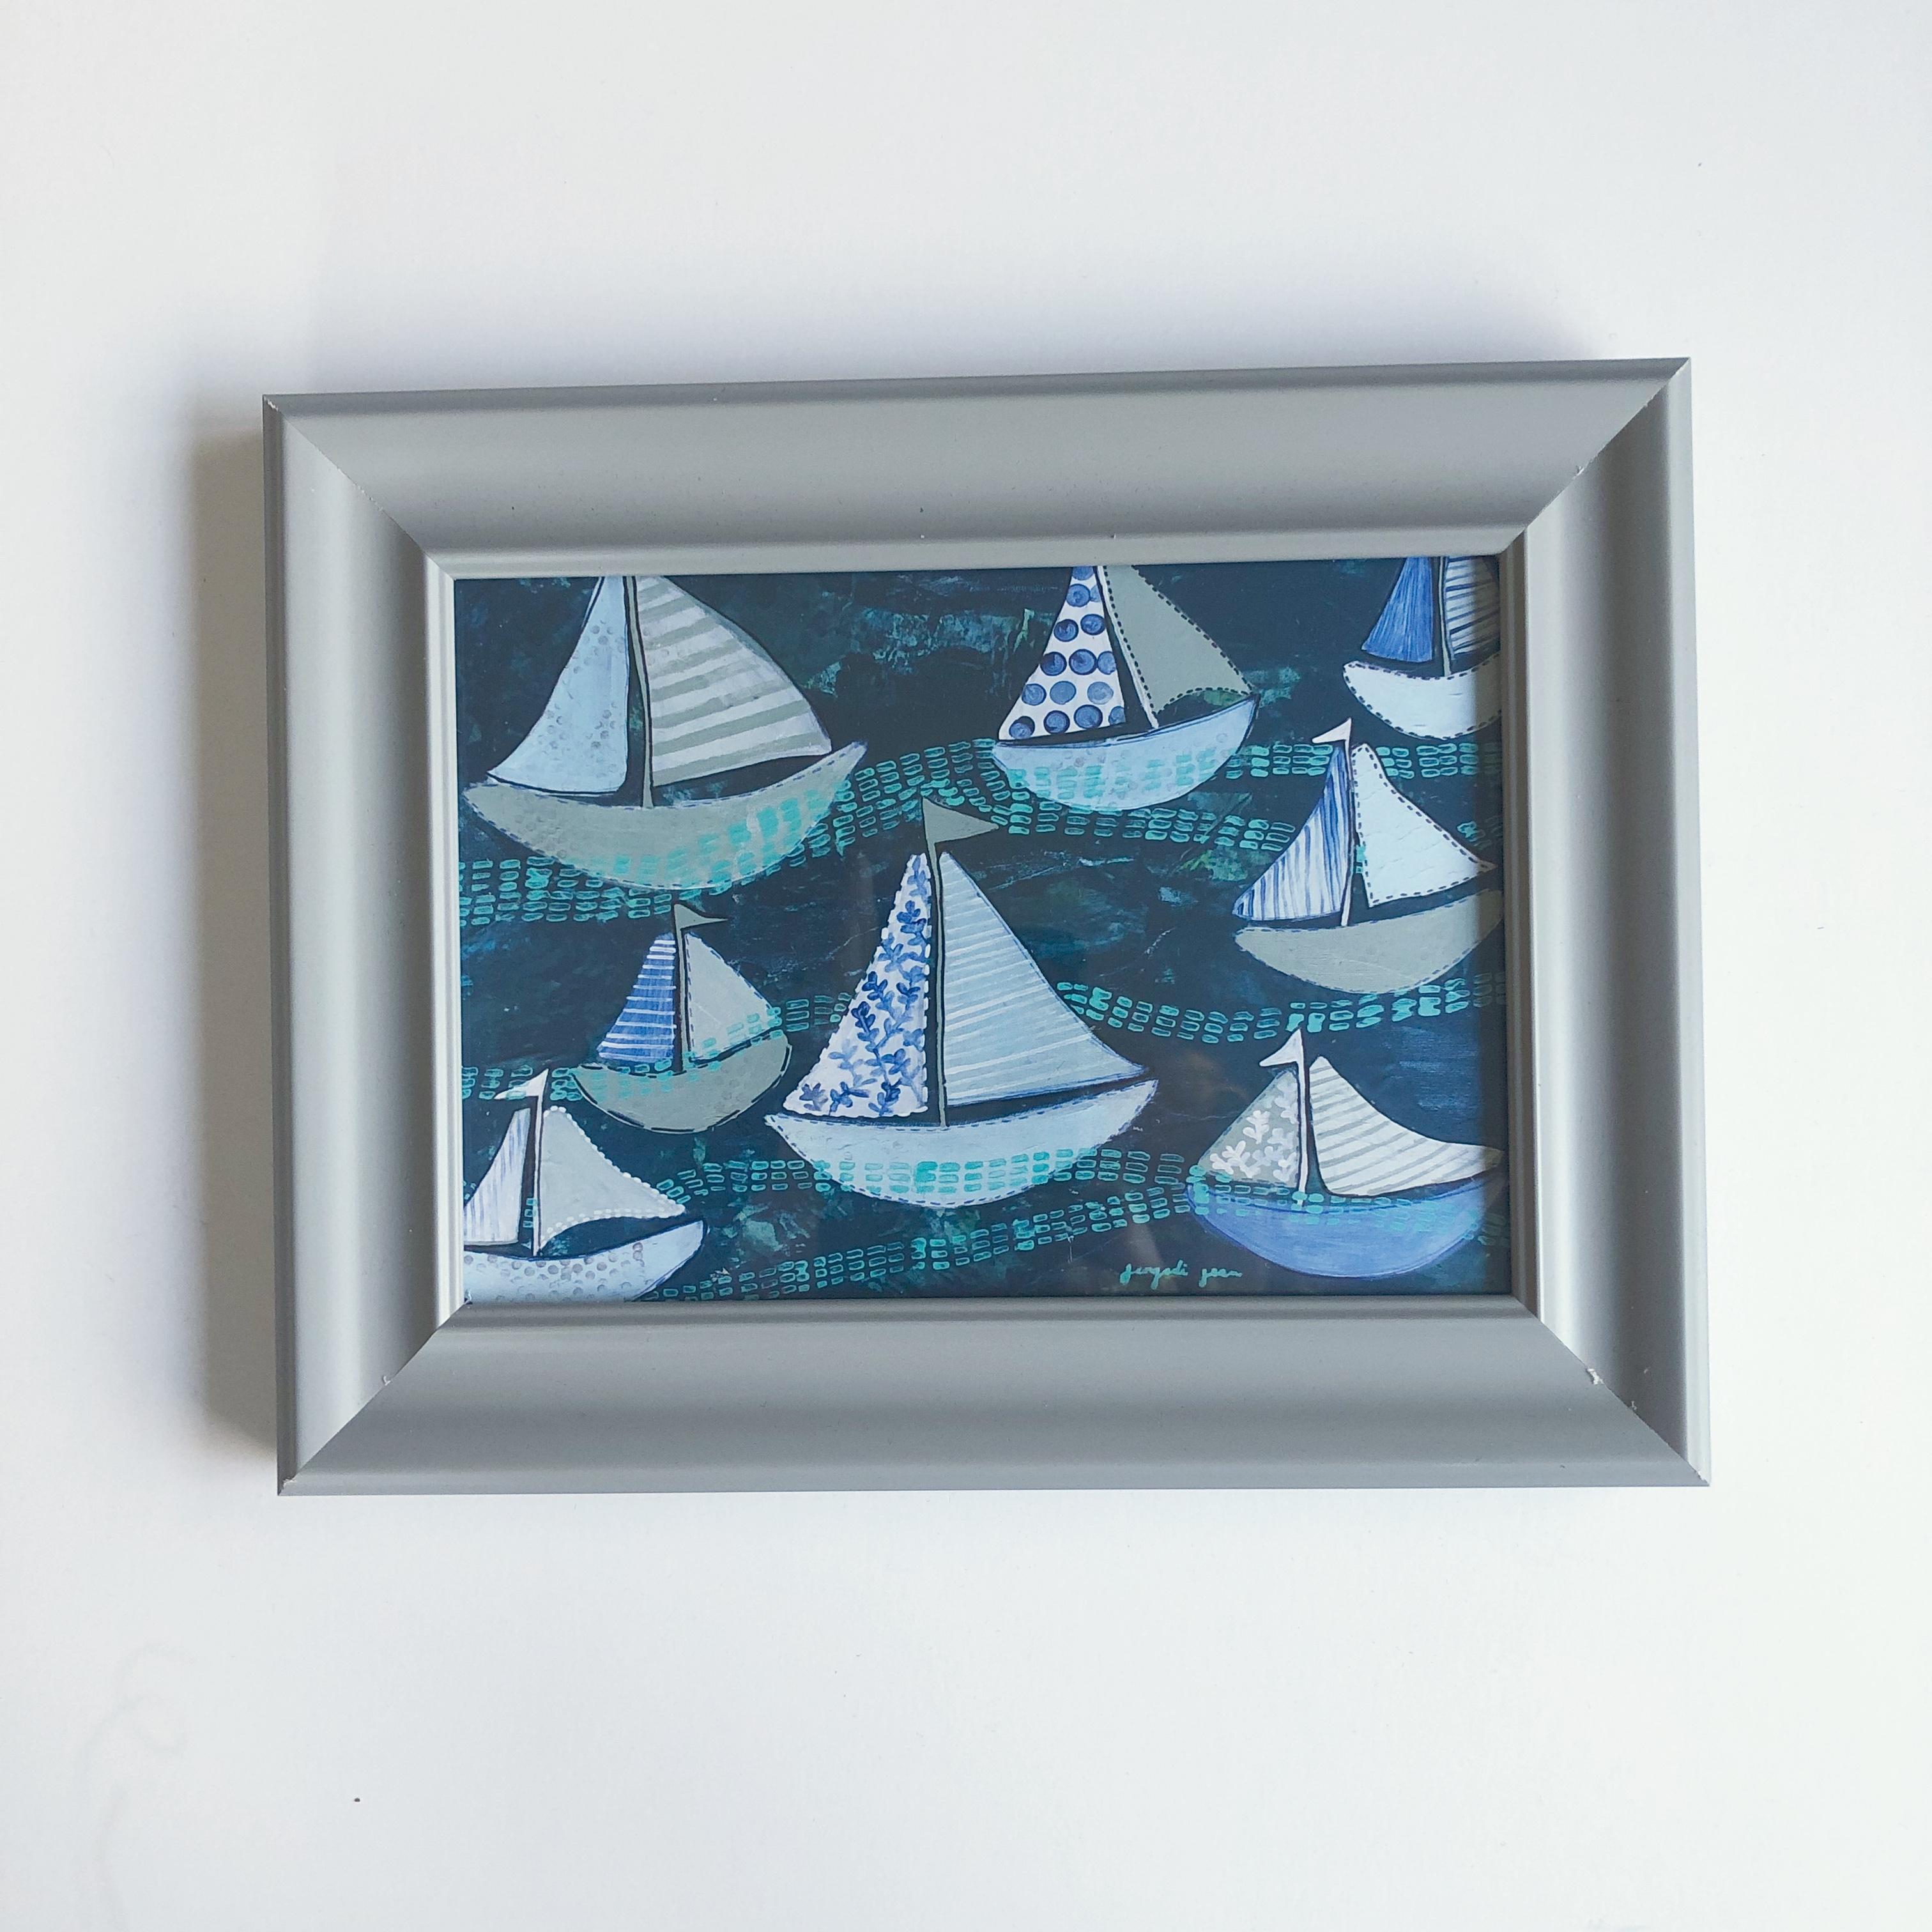 Mini Frame (5x7 Print) No. 4 00169